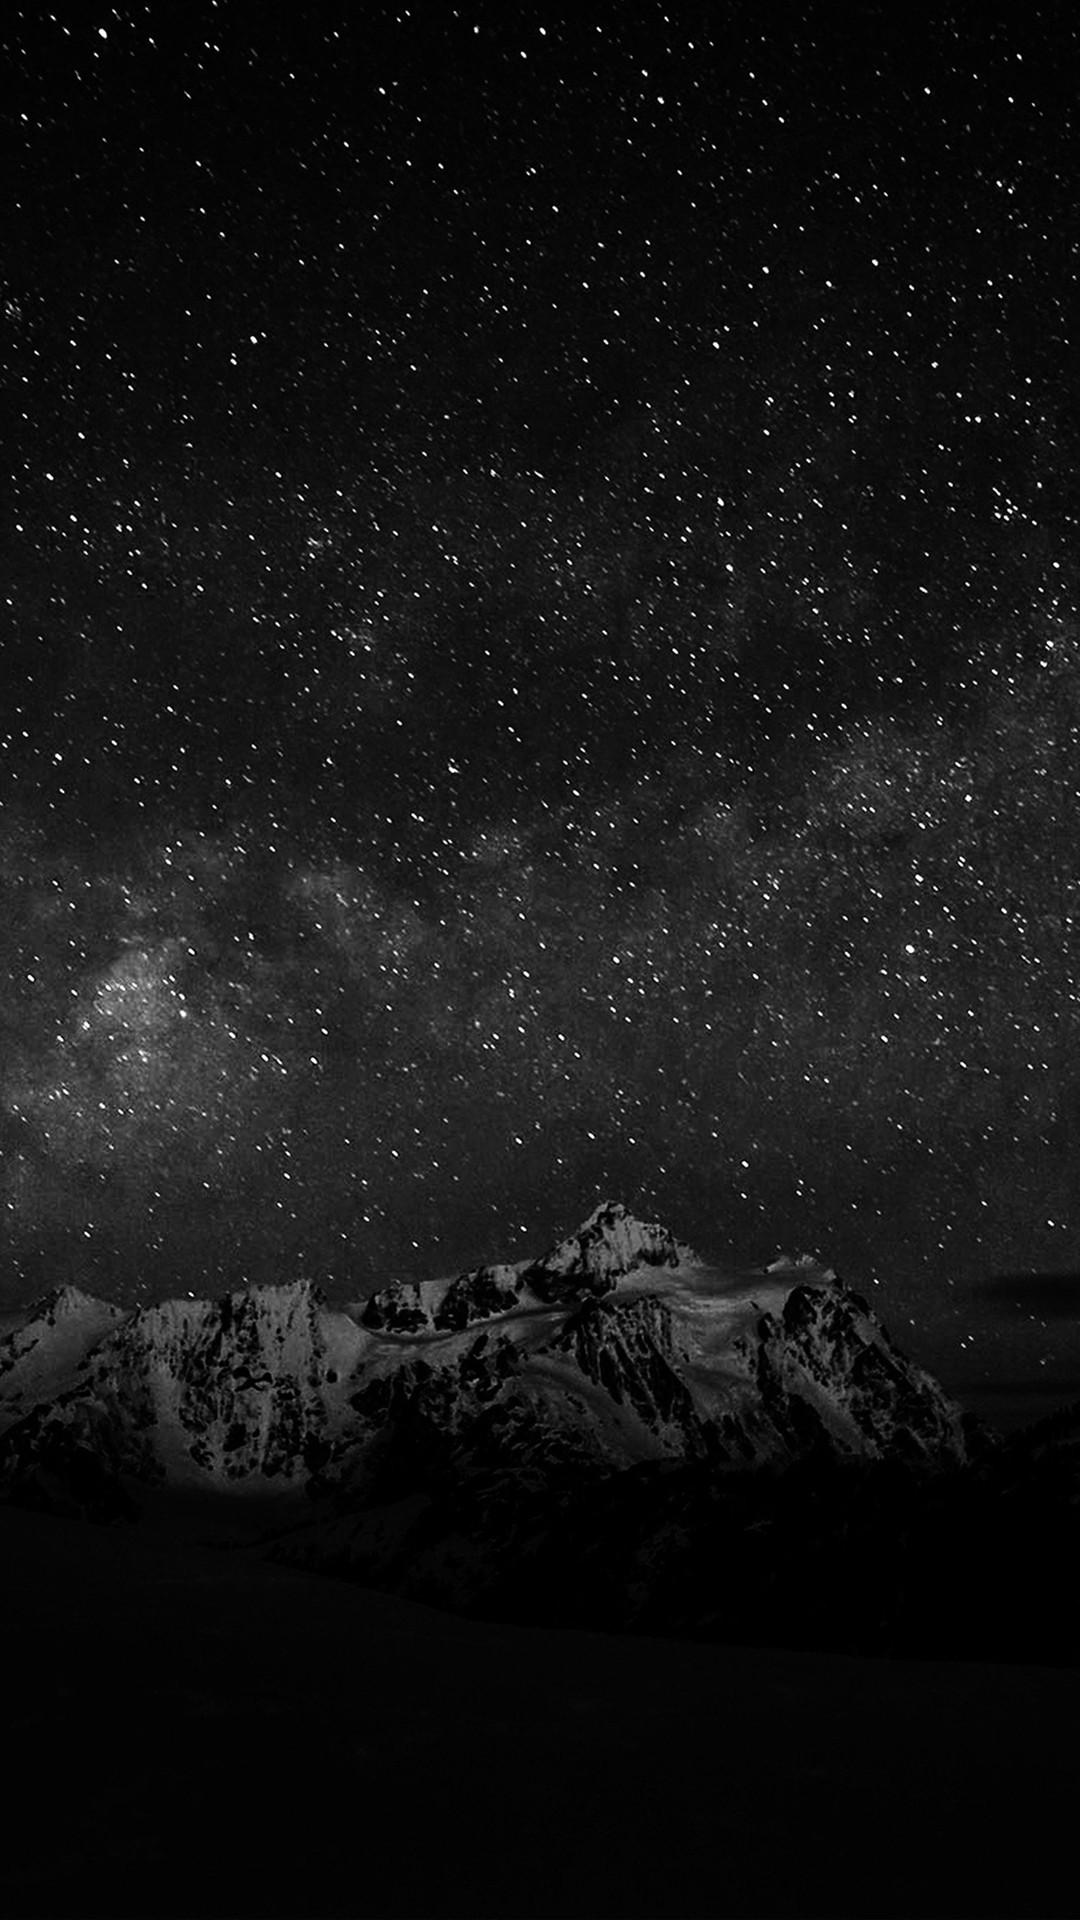 Cool Wallpaper Night Dark - 29992  Perfect Image Reference.jpg